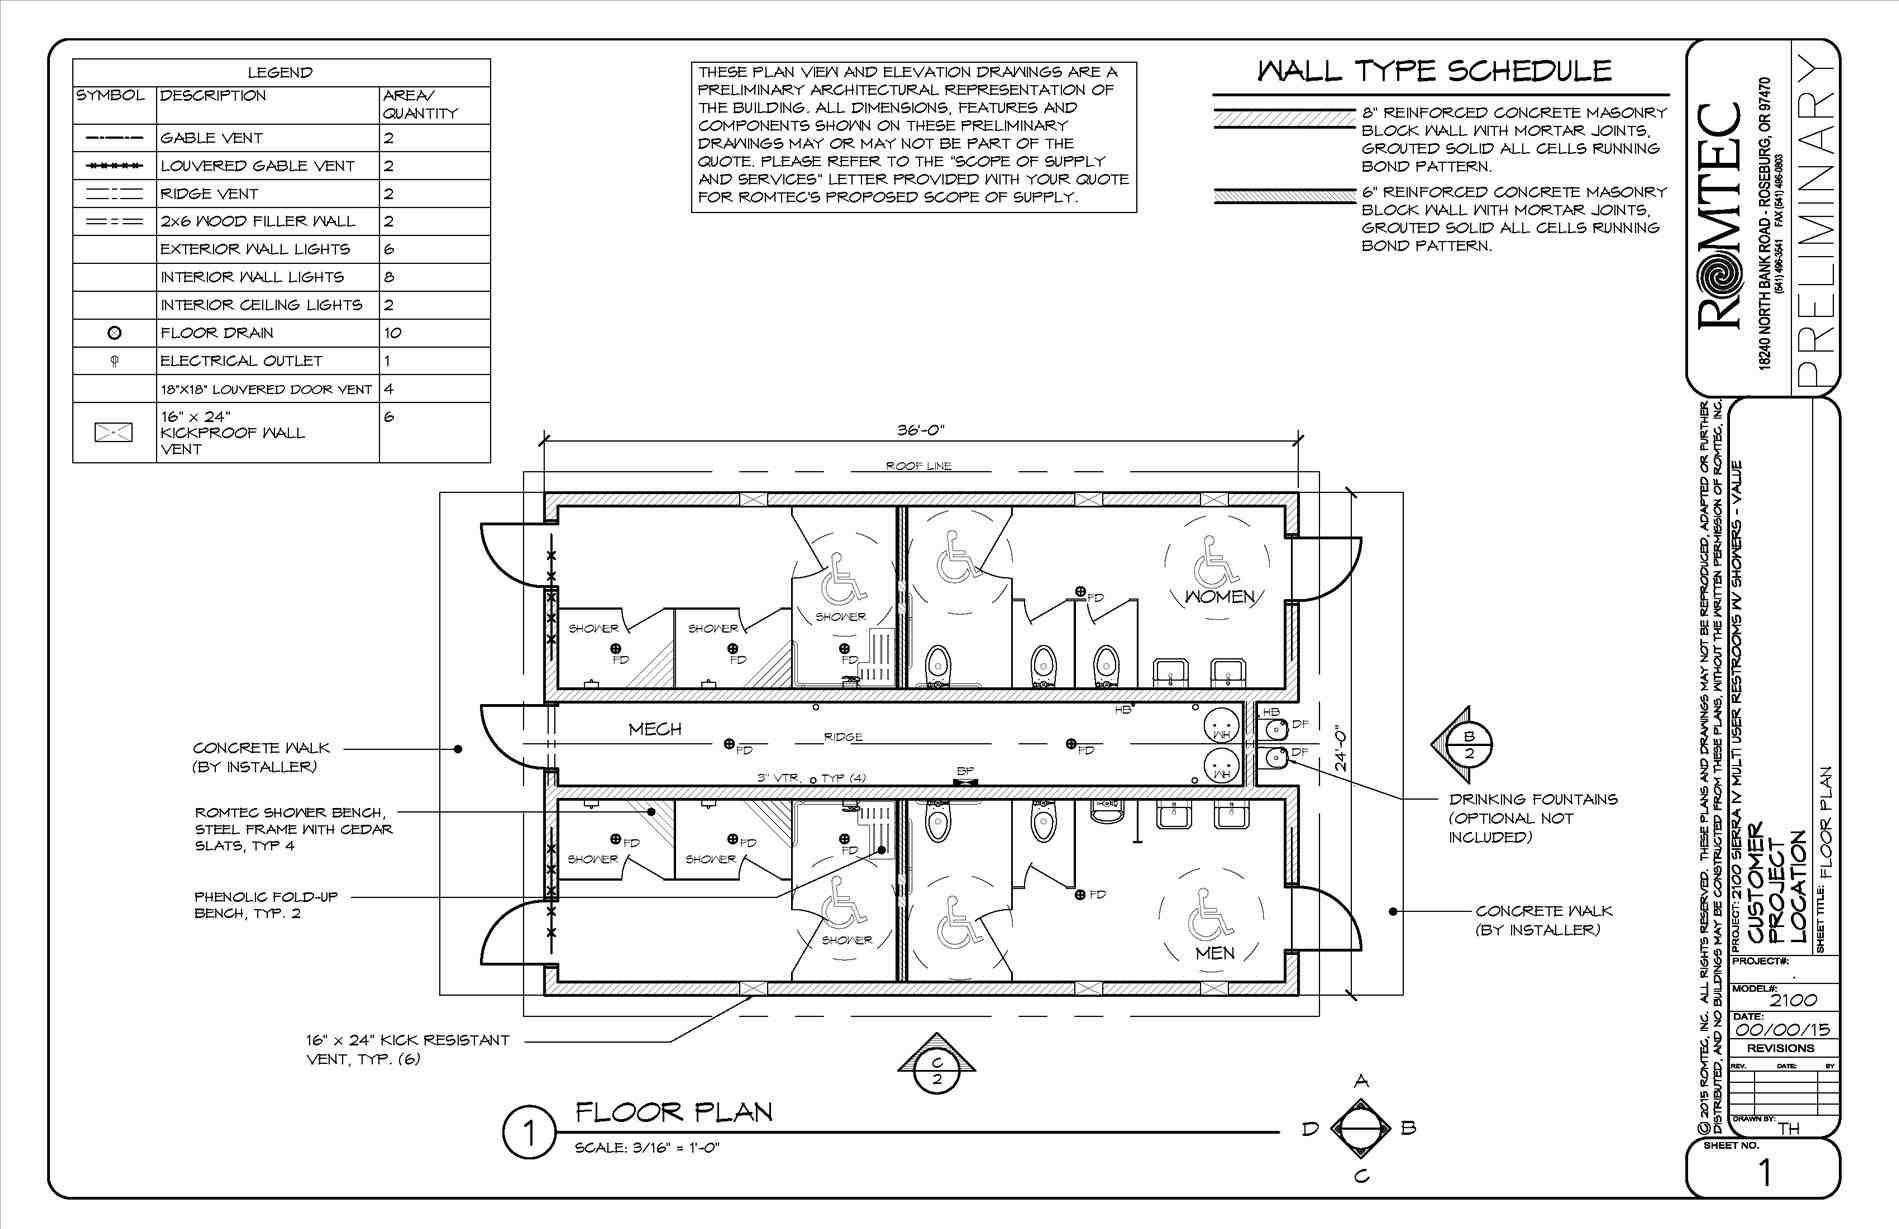 This Public Bathroom Plan